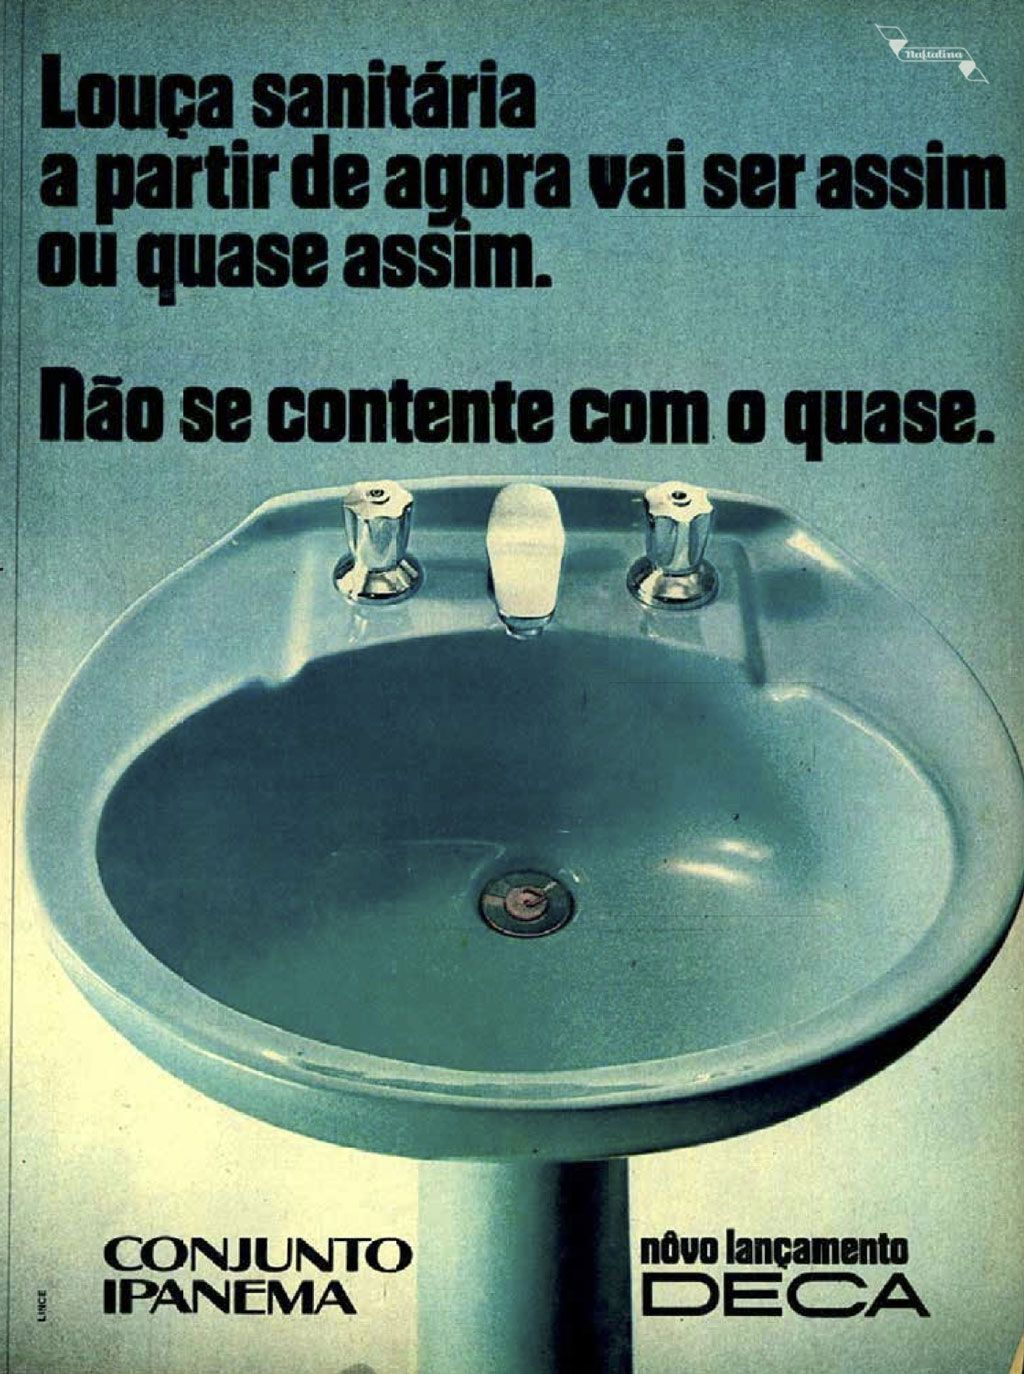 Deca - Conjunto Ipanema #Brasil #anos70 #retro #anunciosAntigos #vintageAds